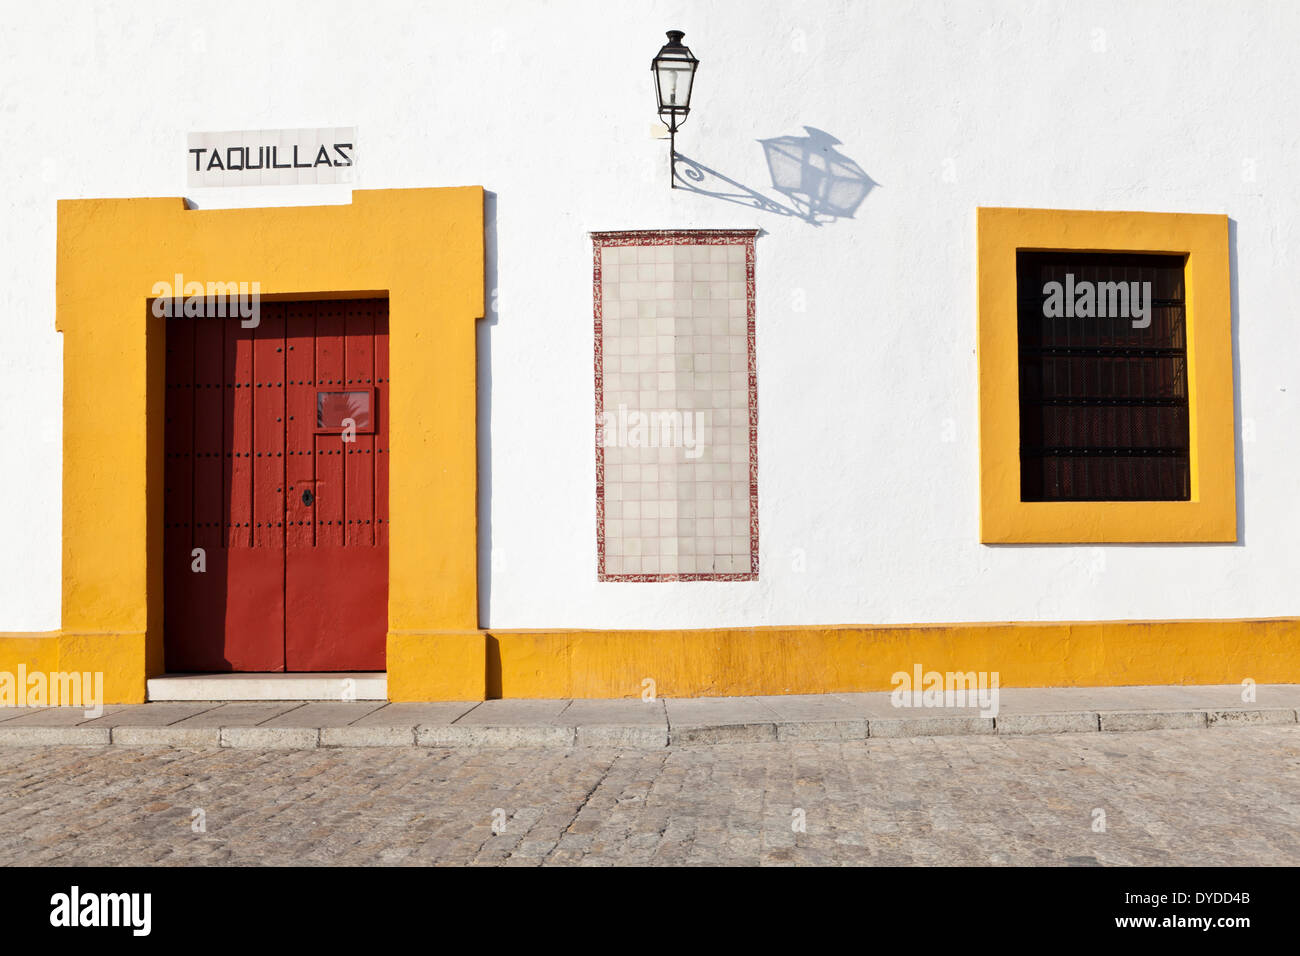 Exterior gates of the Plaza de toros de la Real Maestranza. - Stock Image